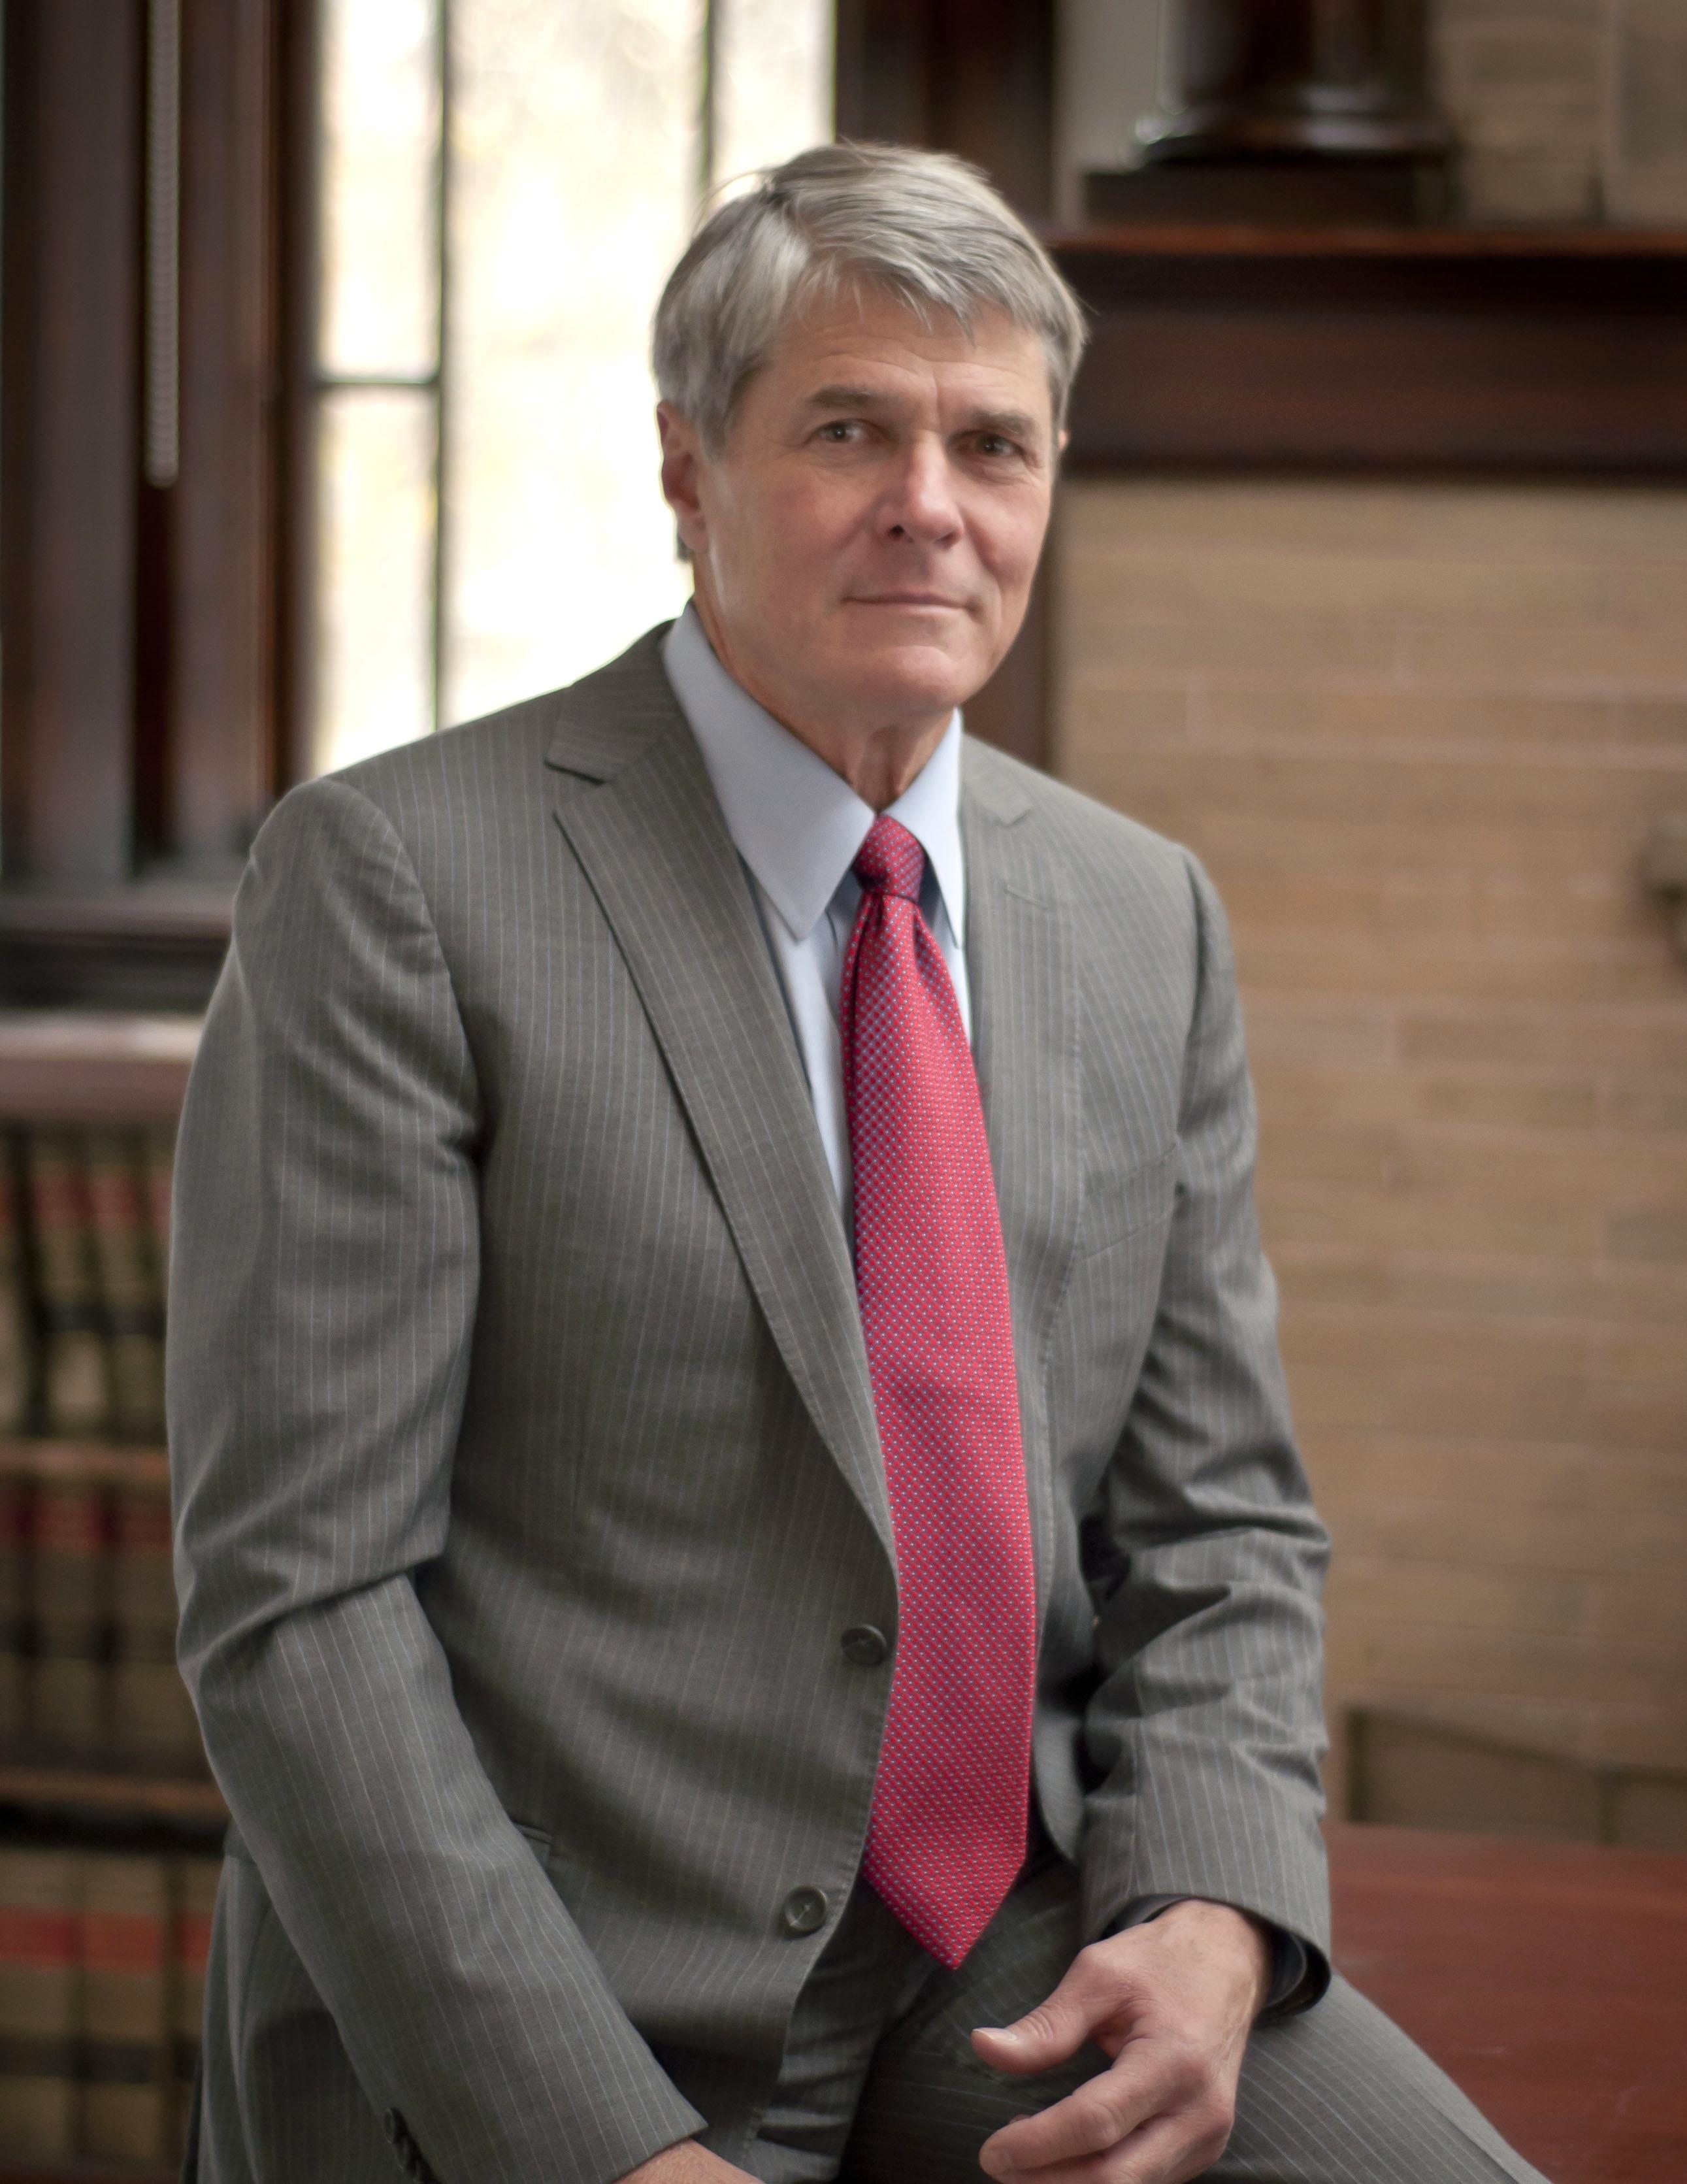 John F. Greenfield, Of Counsel